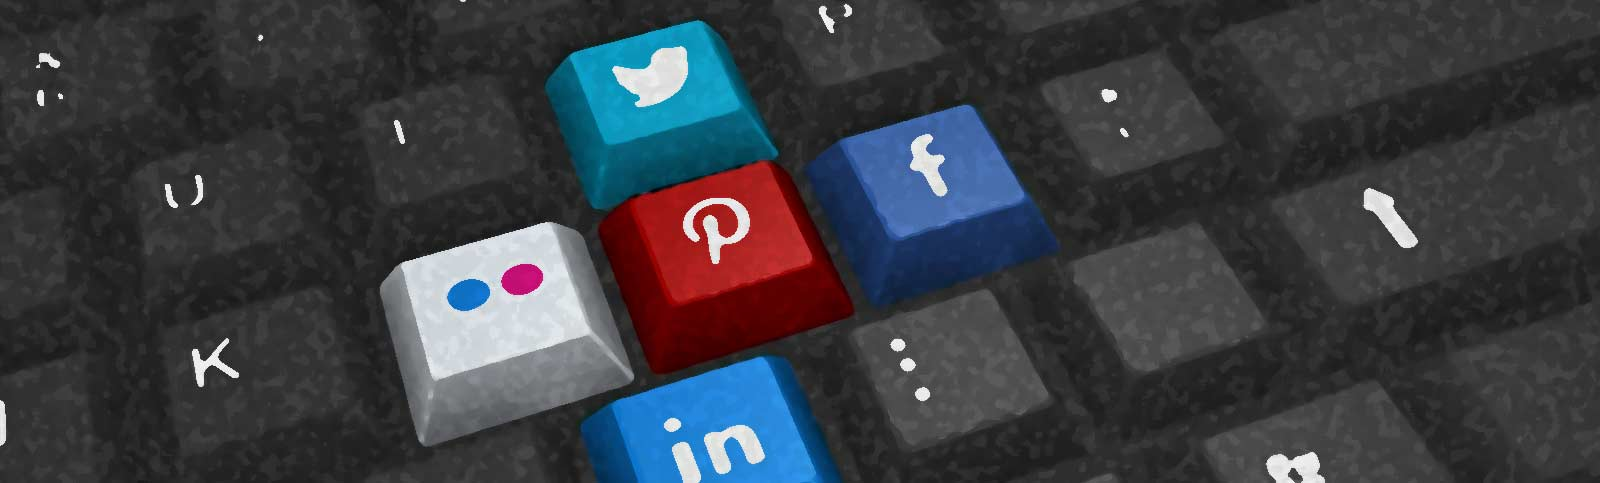 Why Post-Lockdown Business Revolves Around Digital Marketing